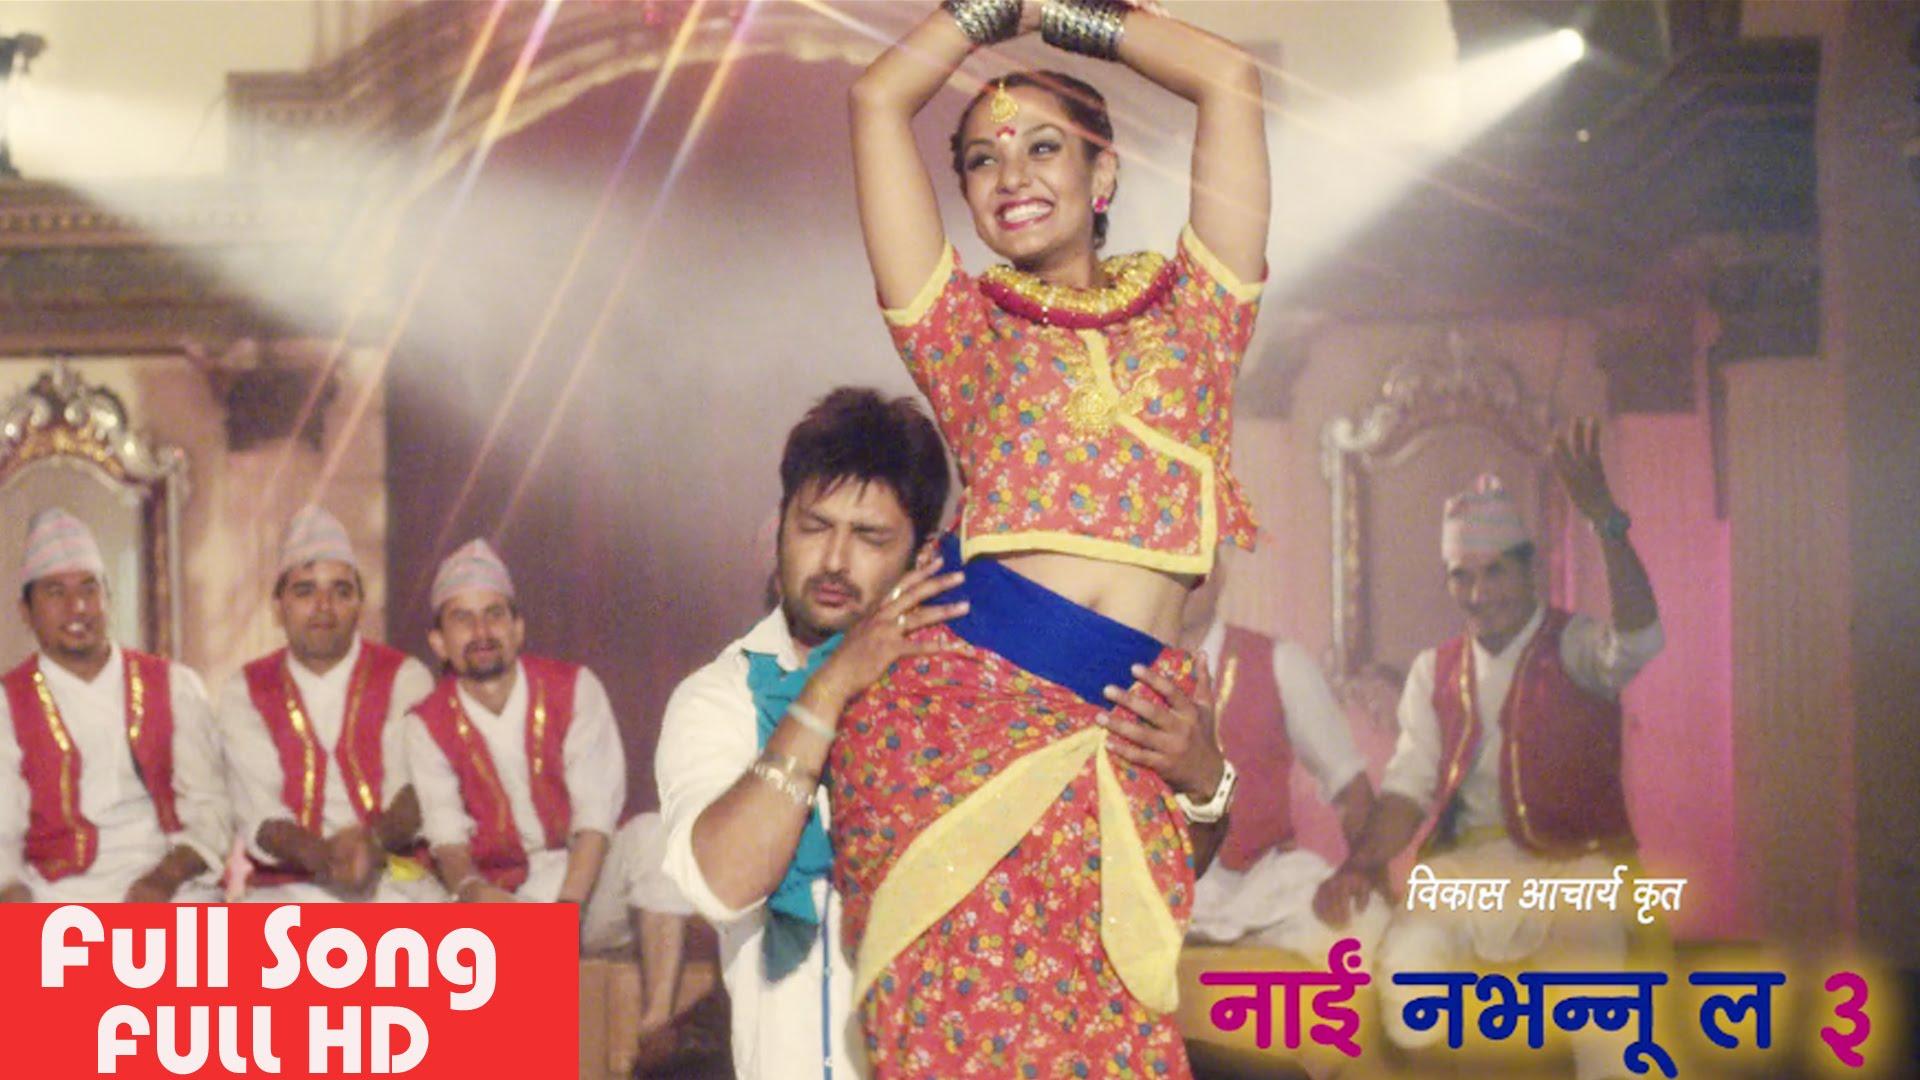 Nepali movie chahanchu ma timilai nai / Bash 4 3 release notes